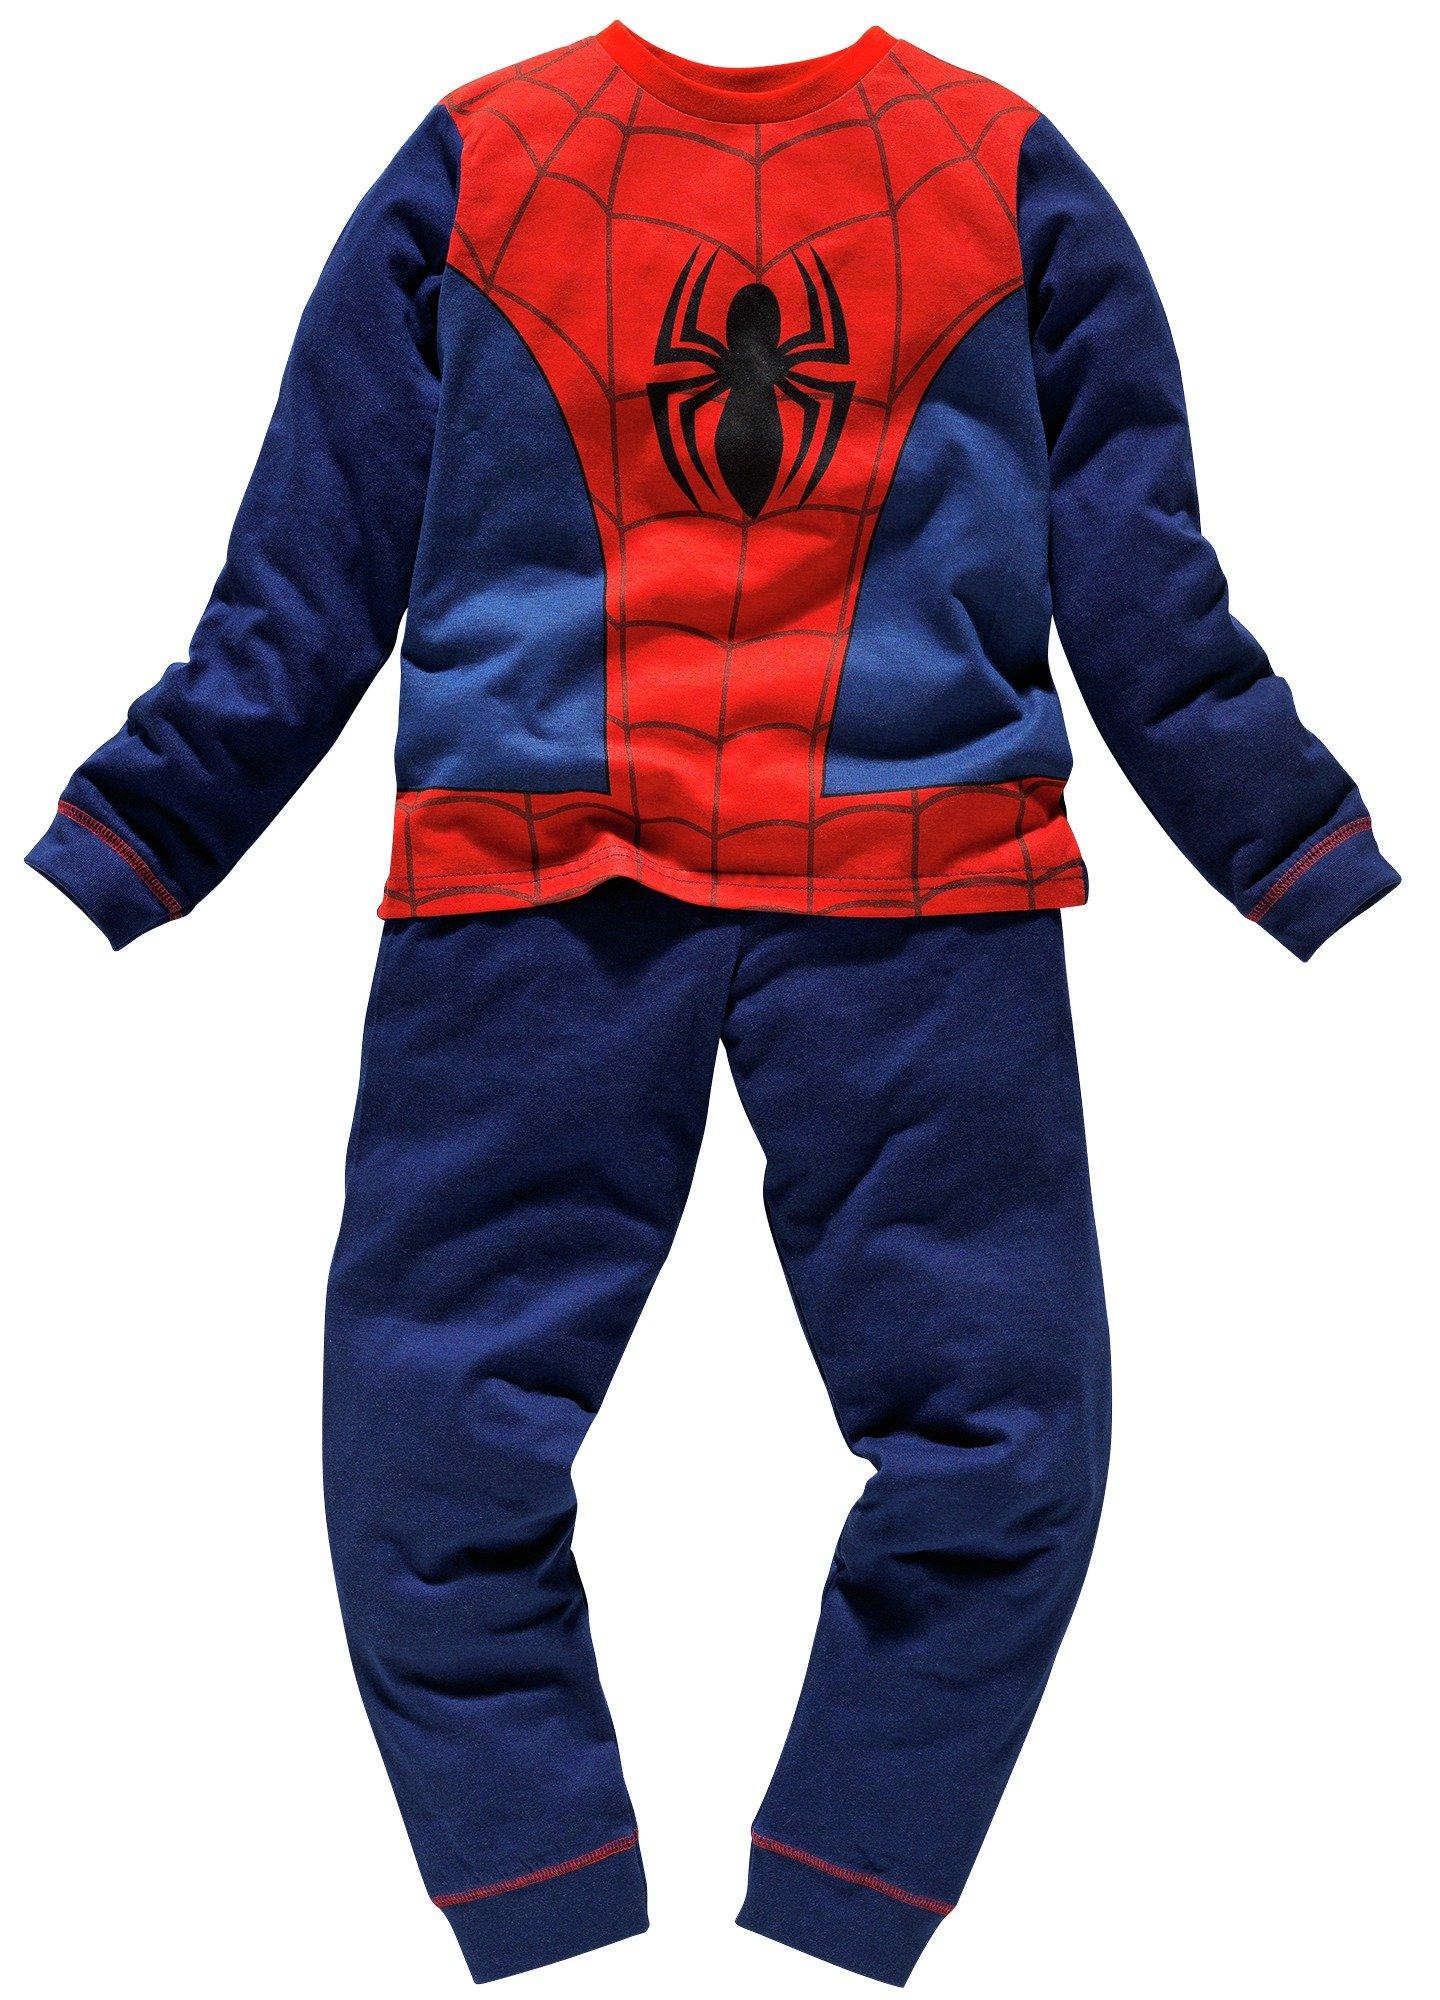 Spider-Man Novelty Pyjamas - 2-3 Years